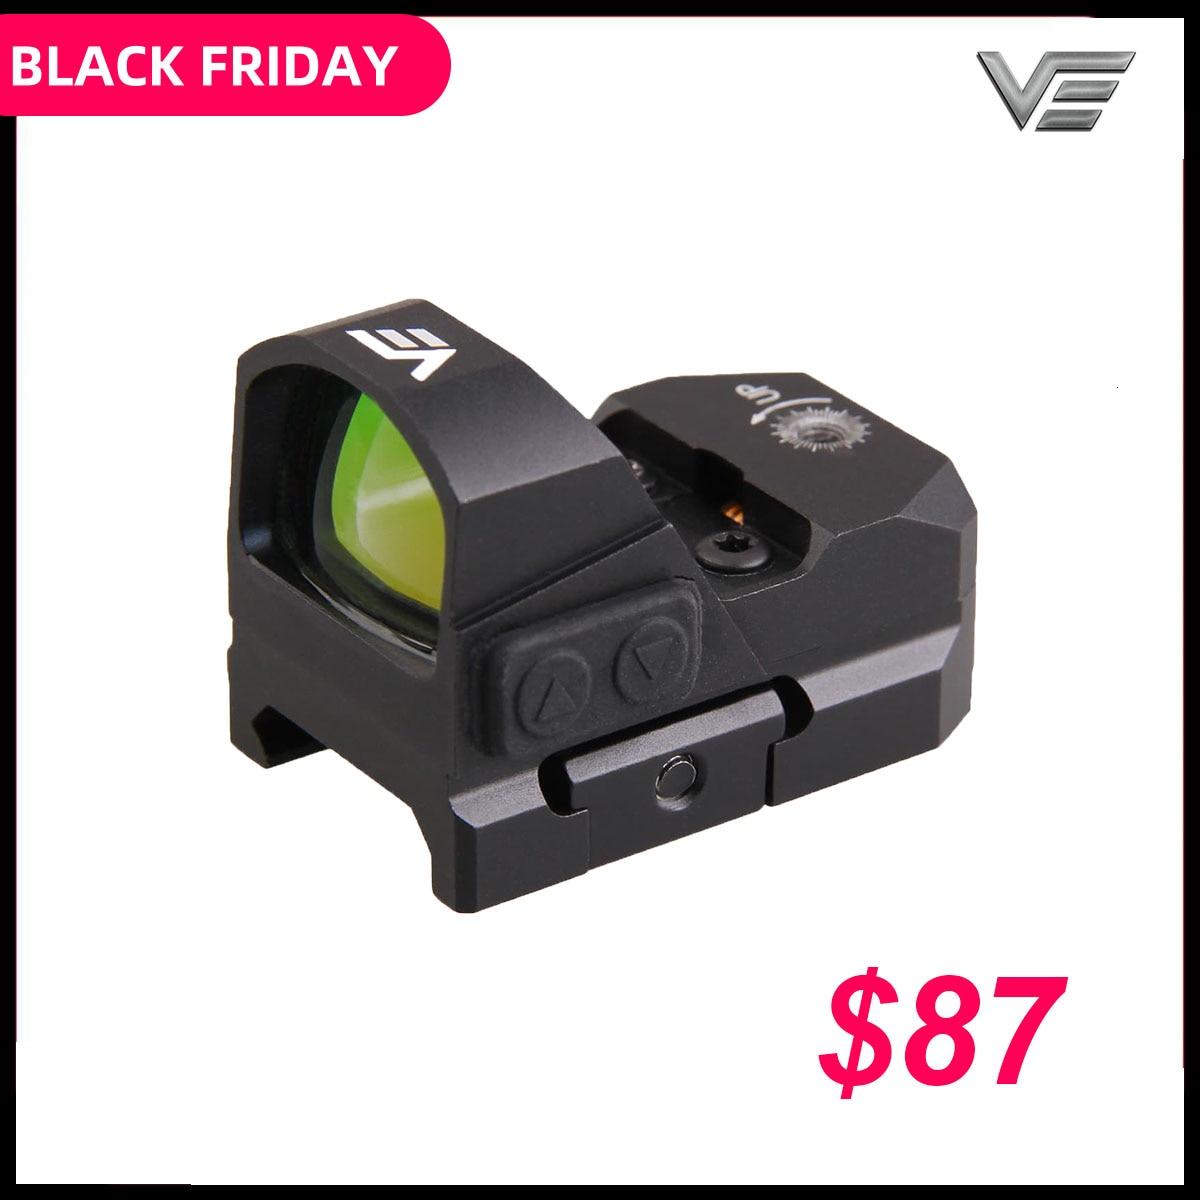 Vector Optics Frenzy 1x17x24 AR15 M4 AK47 Pistol Red Dot Scope 9mm Mini Sight With Water Proof Fit 21mm Picatinny GLOCK 17 19